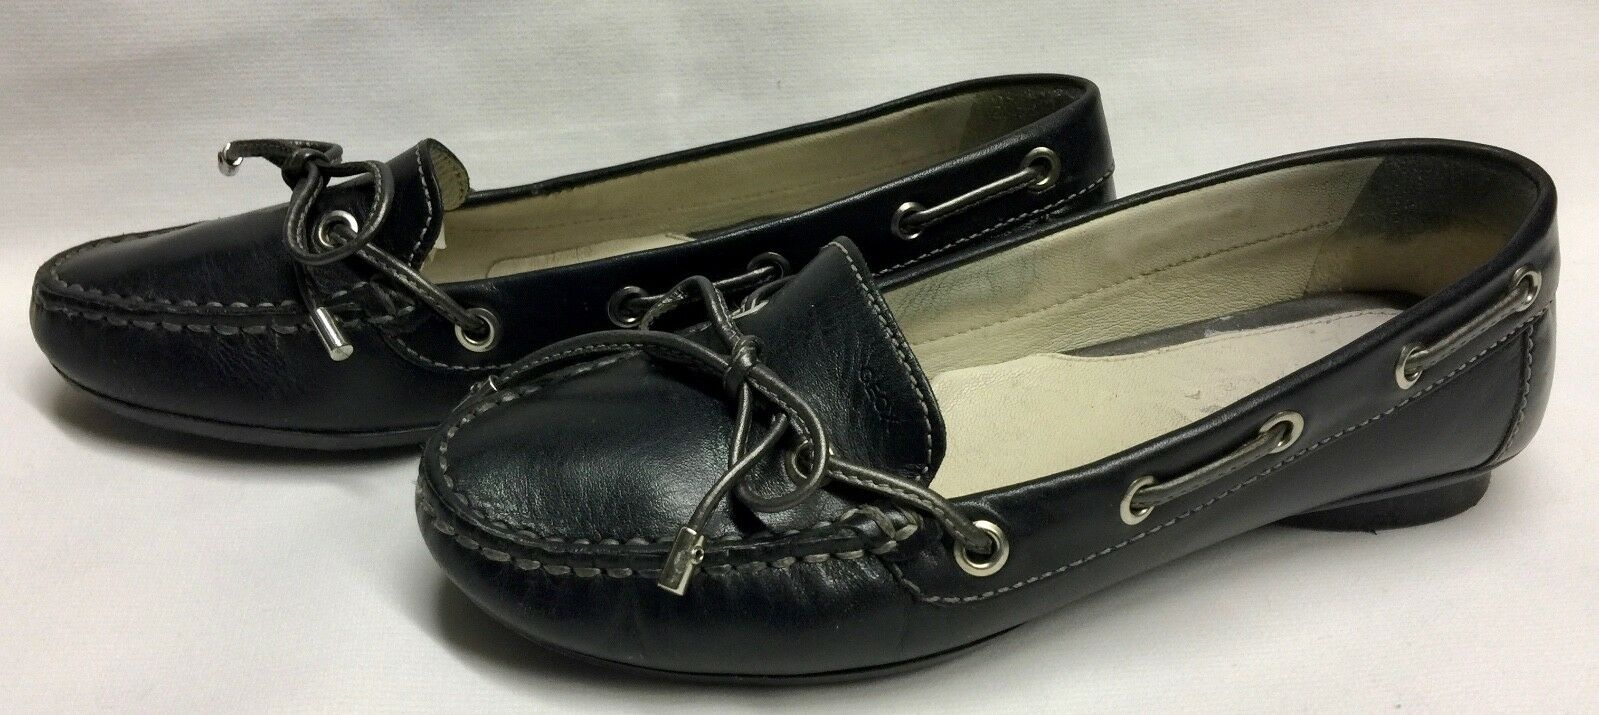 Geox D9138C Damen-Schuhe Lace Loafers Leder Gr 36 schwarz Mokassins schwarz 36 Halbschuhe eca71b